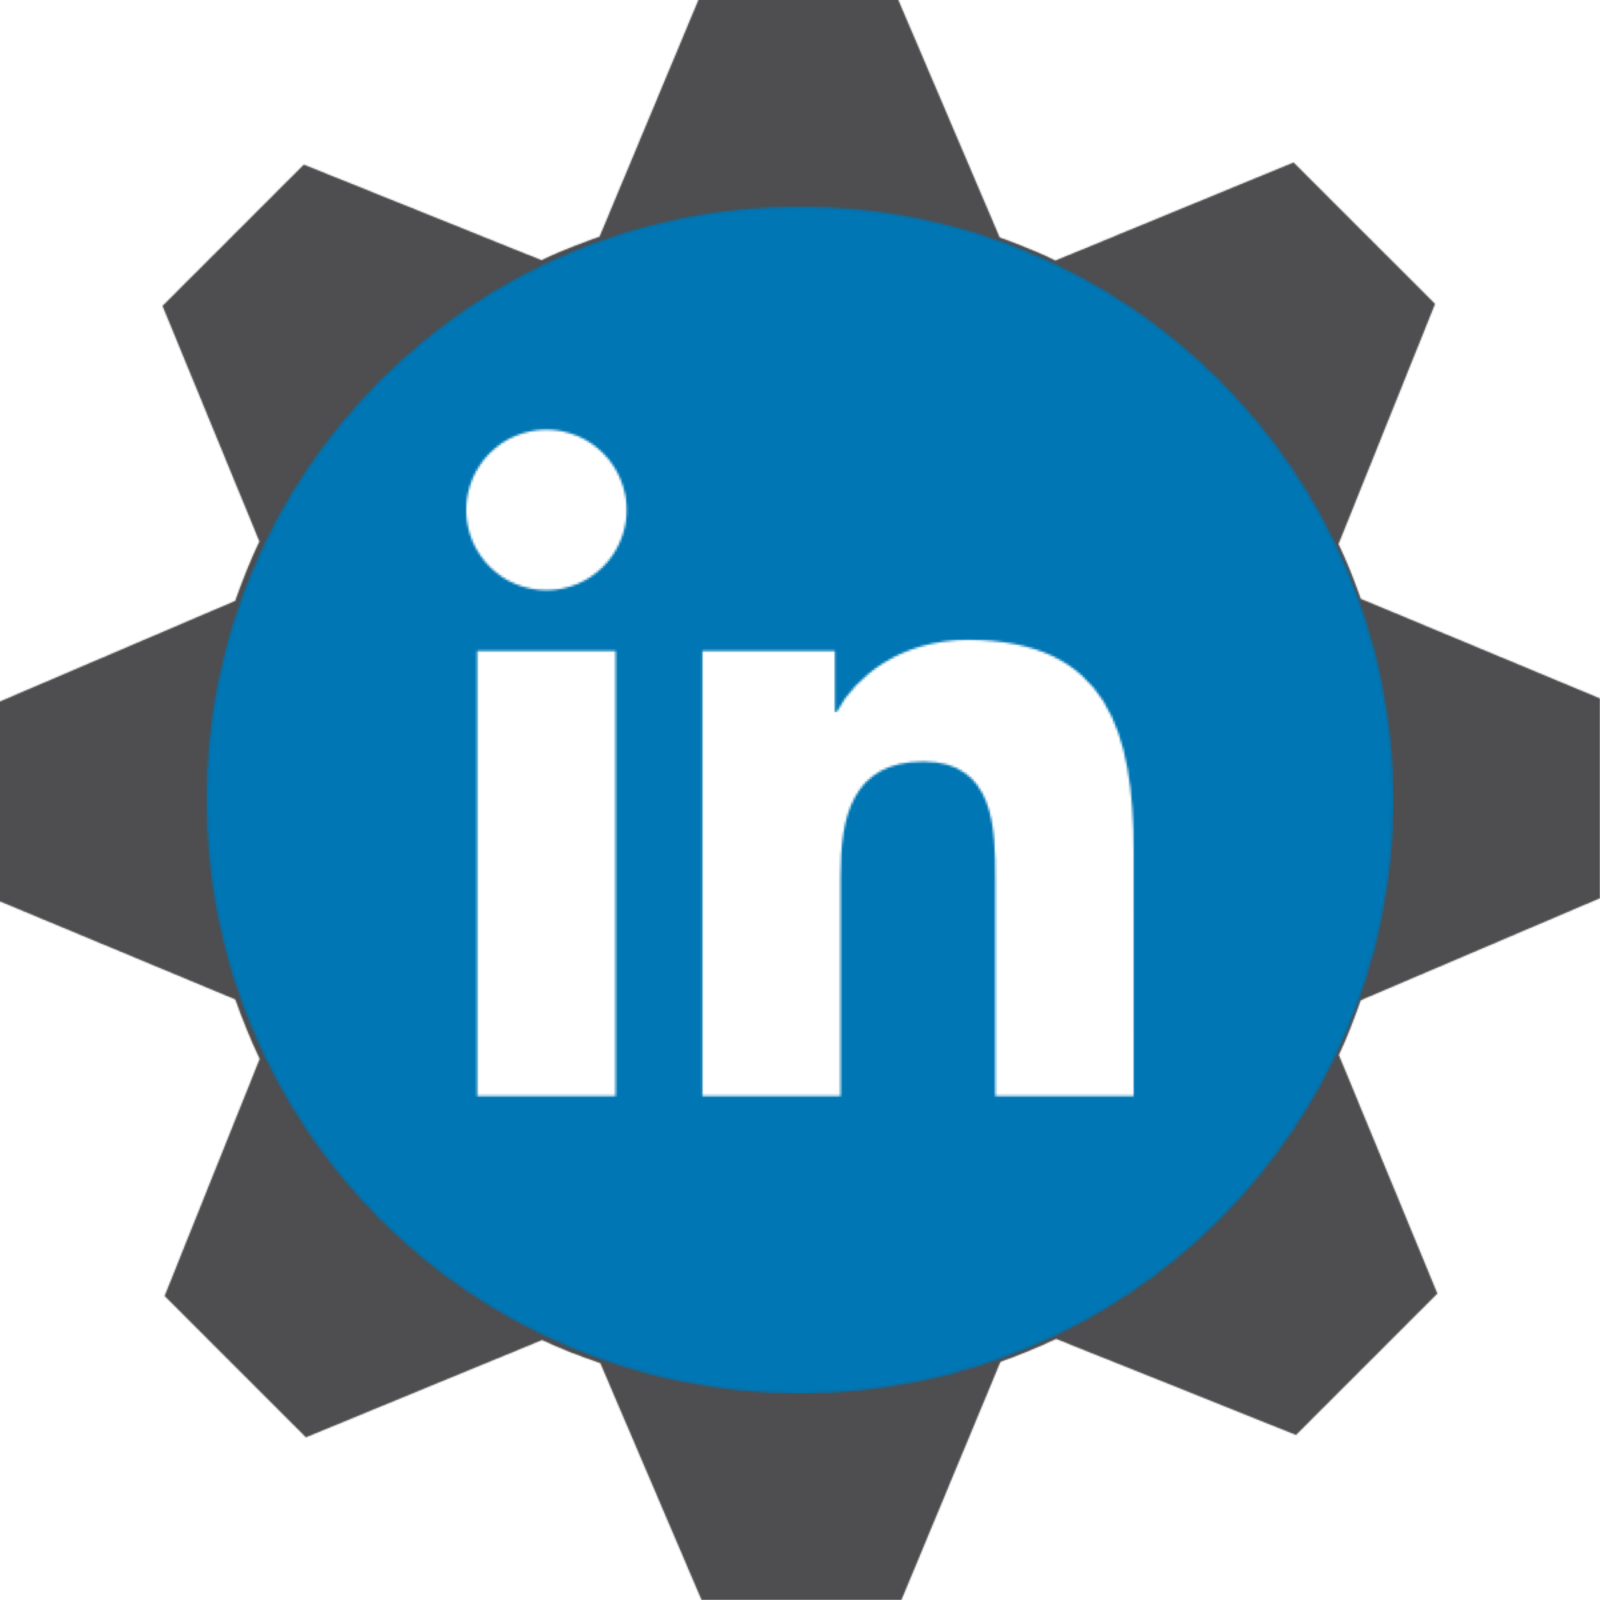 LinkedIn Cog